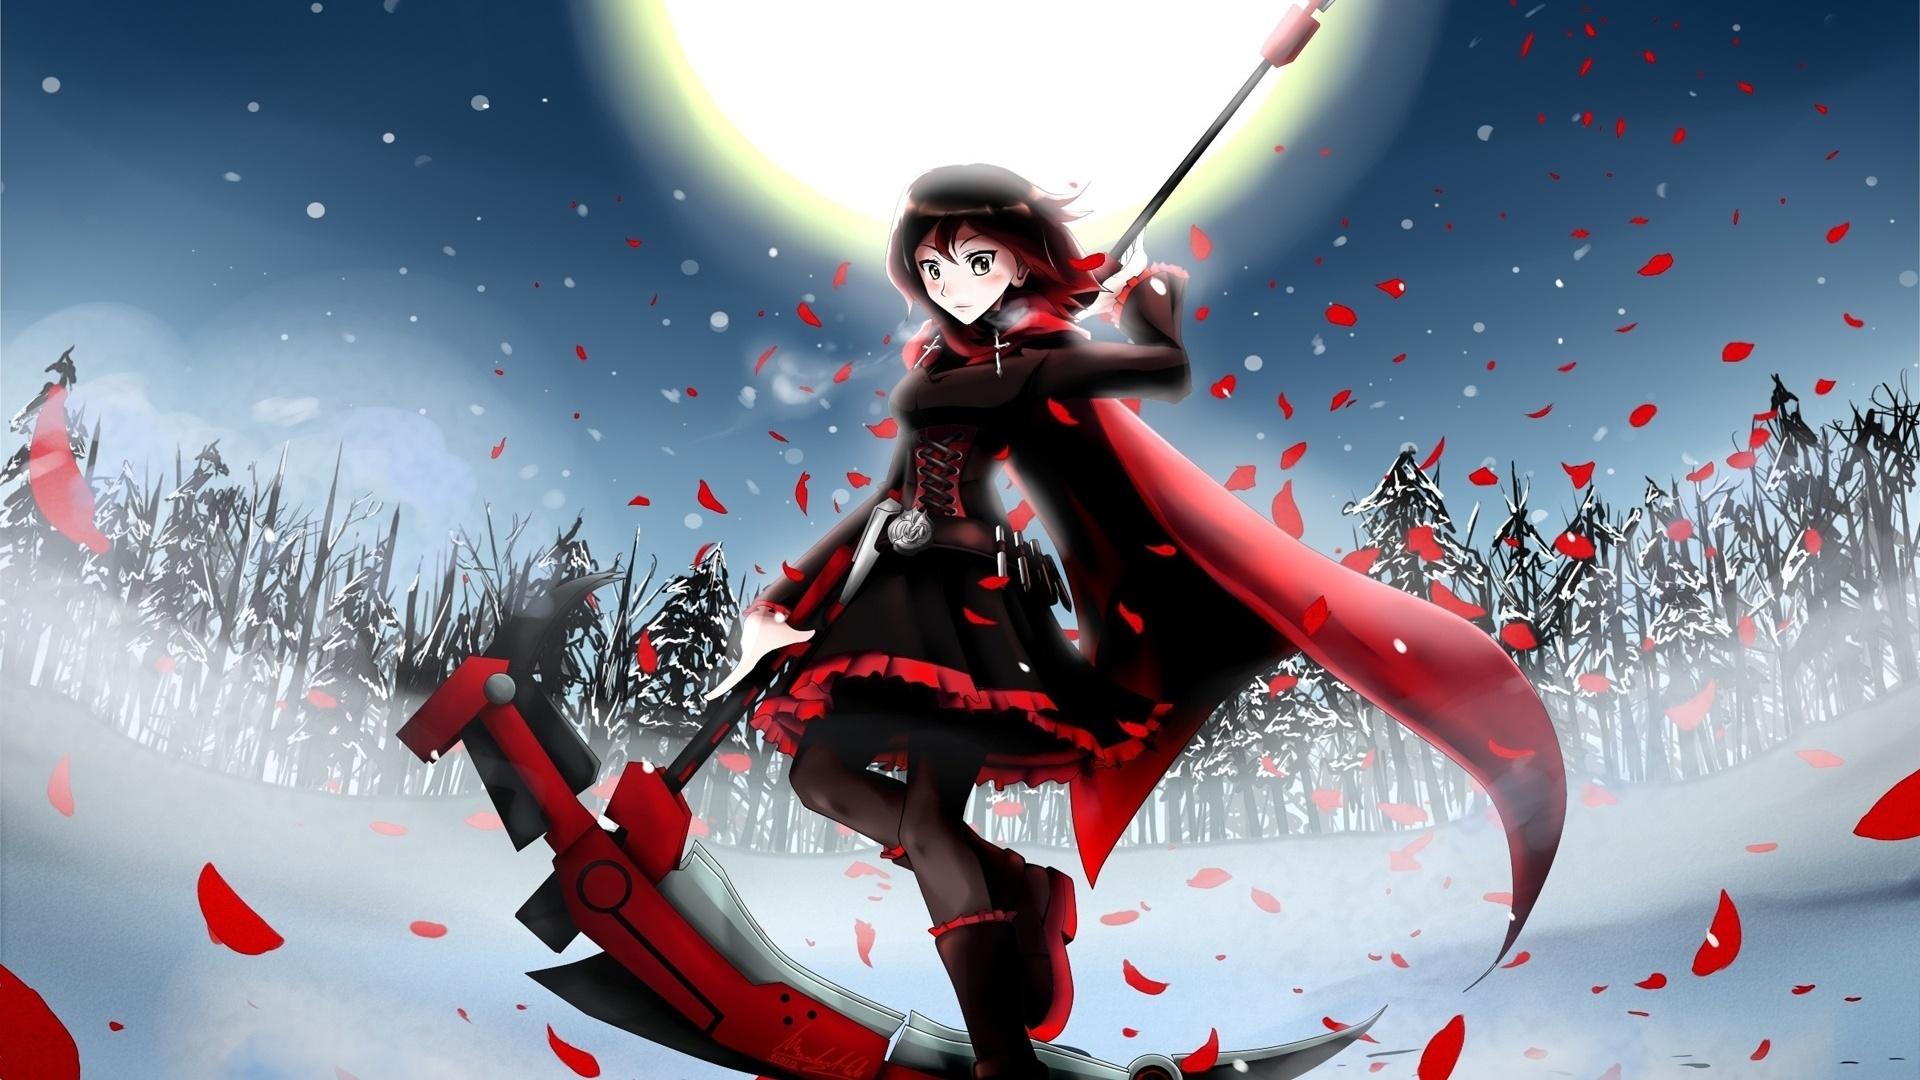 Red Anime Girl High Quality